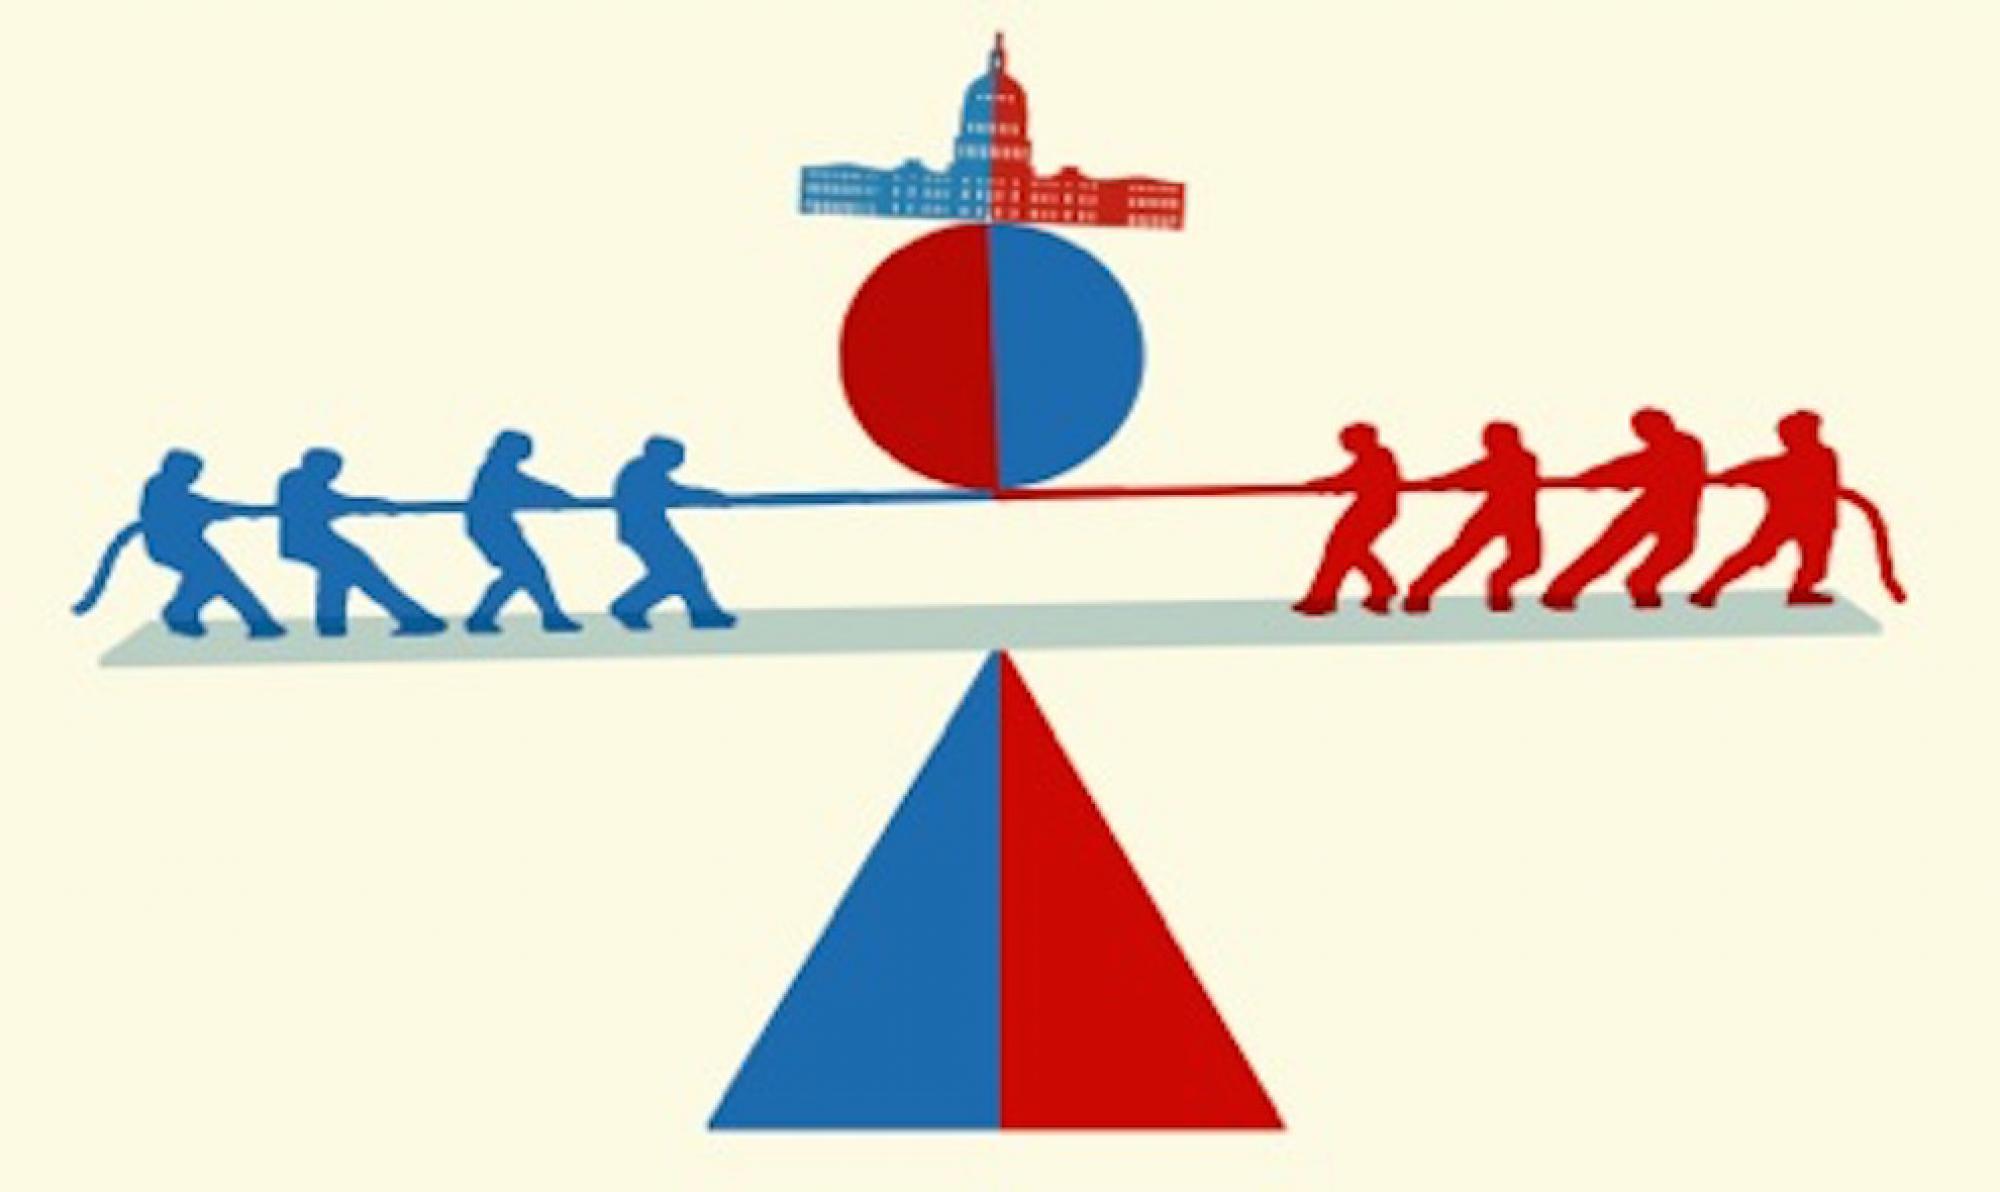 Legislative gridlock